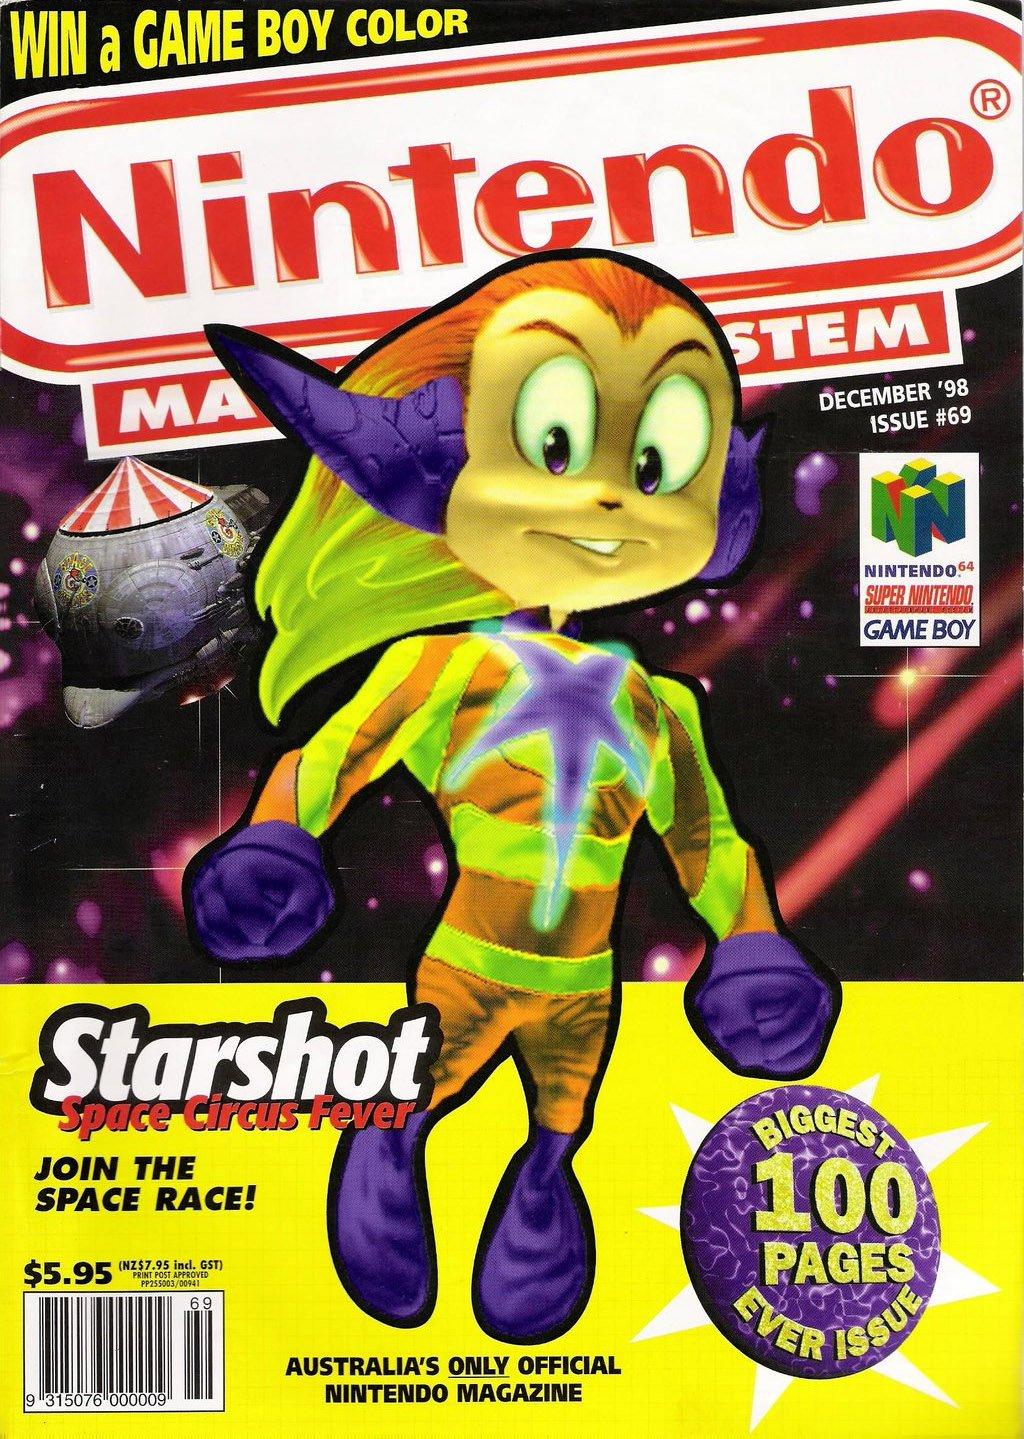 Nintendo Magazine System (AUS) 069 (December 1998)